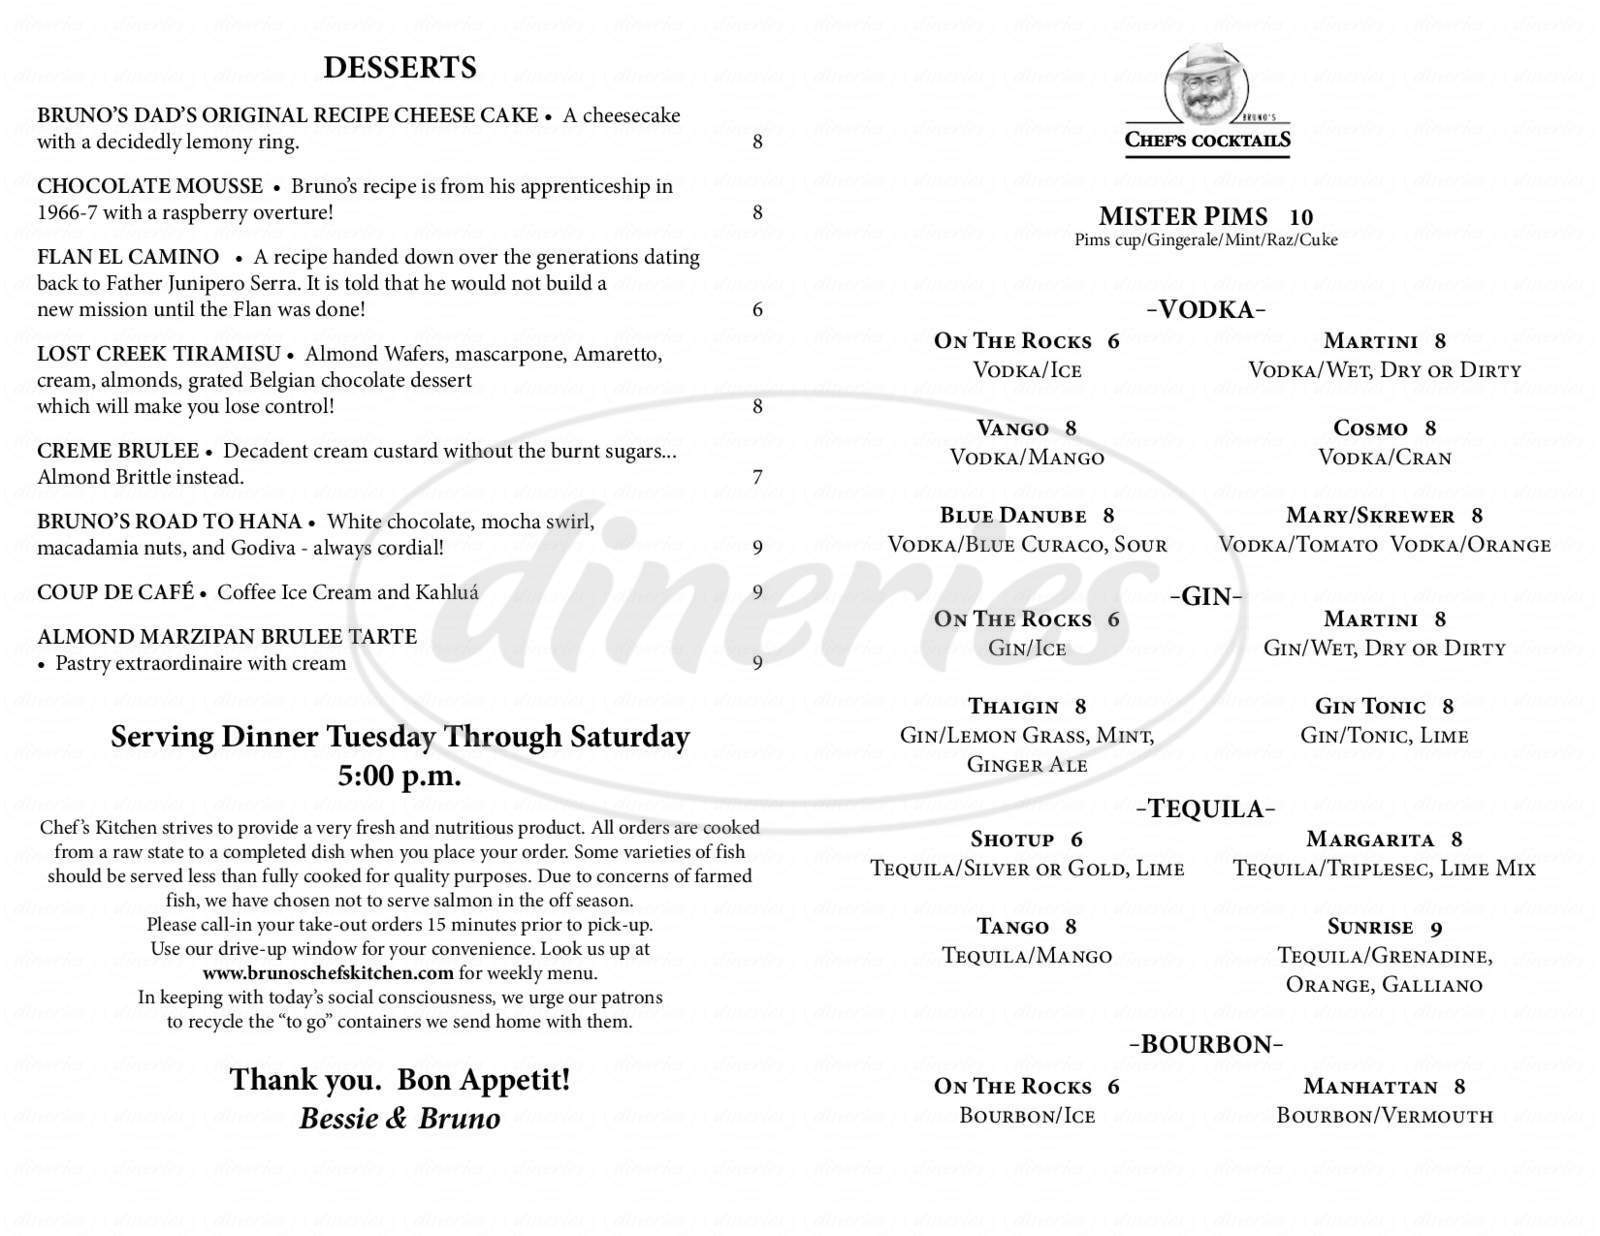 menu for Bruno's Chef's Kitchen